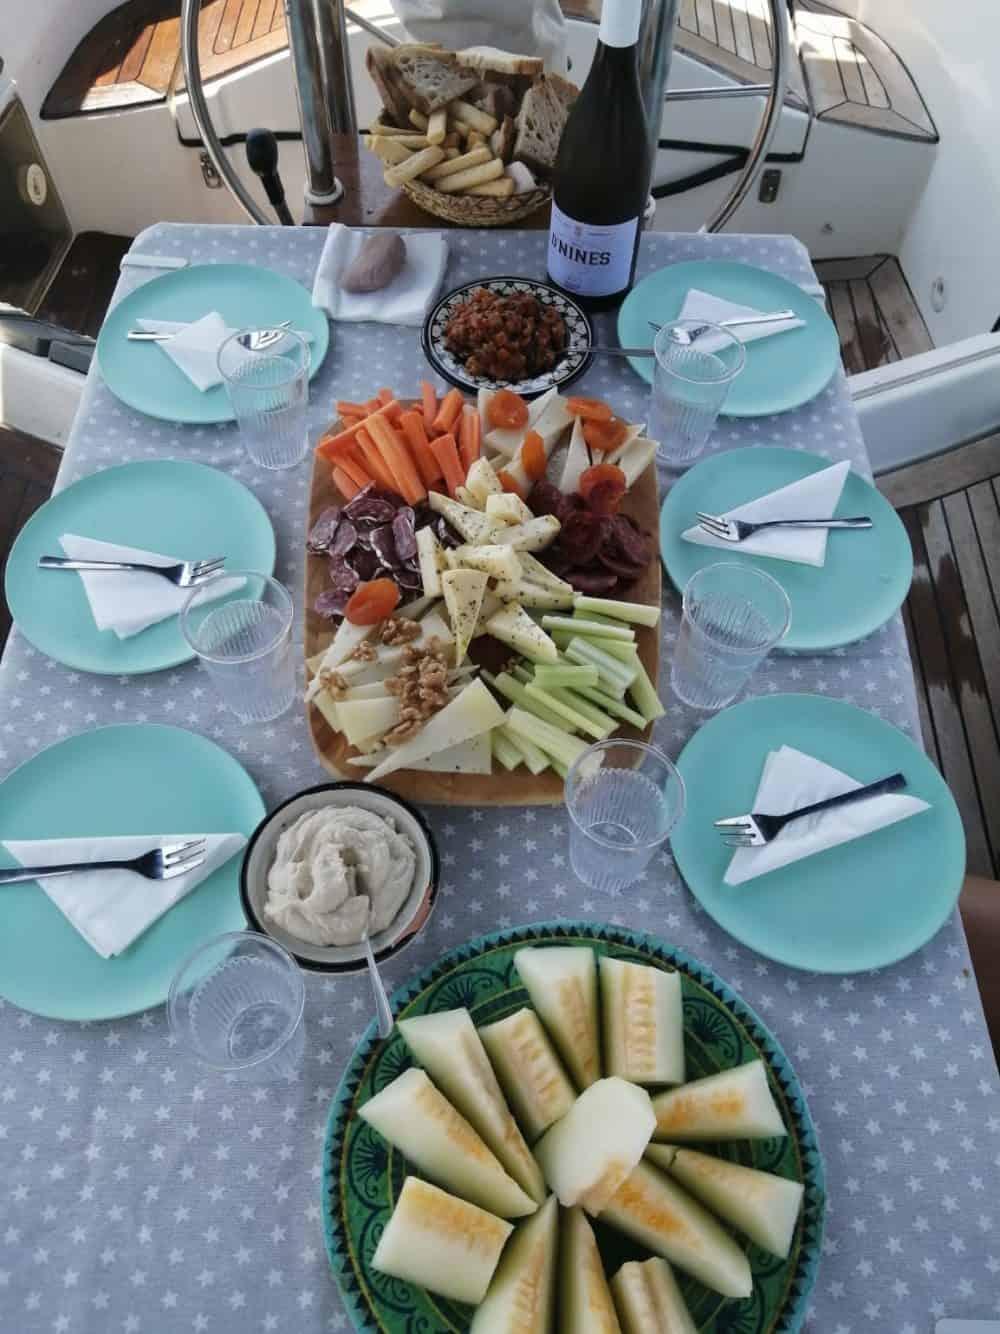 Manjakan diri Spanyol: Pengalaman Berlayar dan Makanan